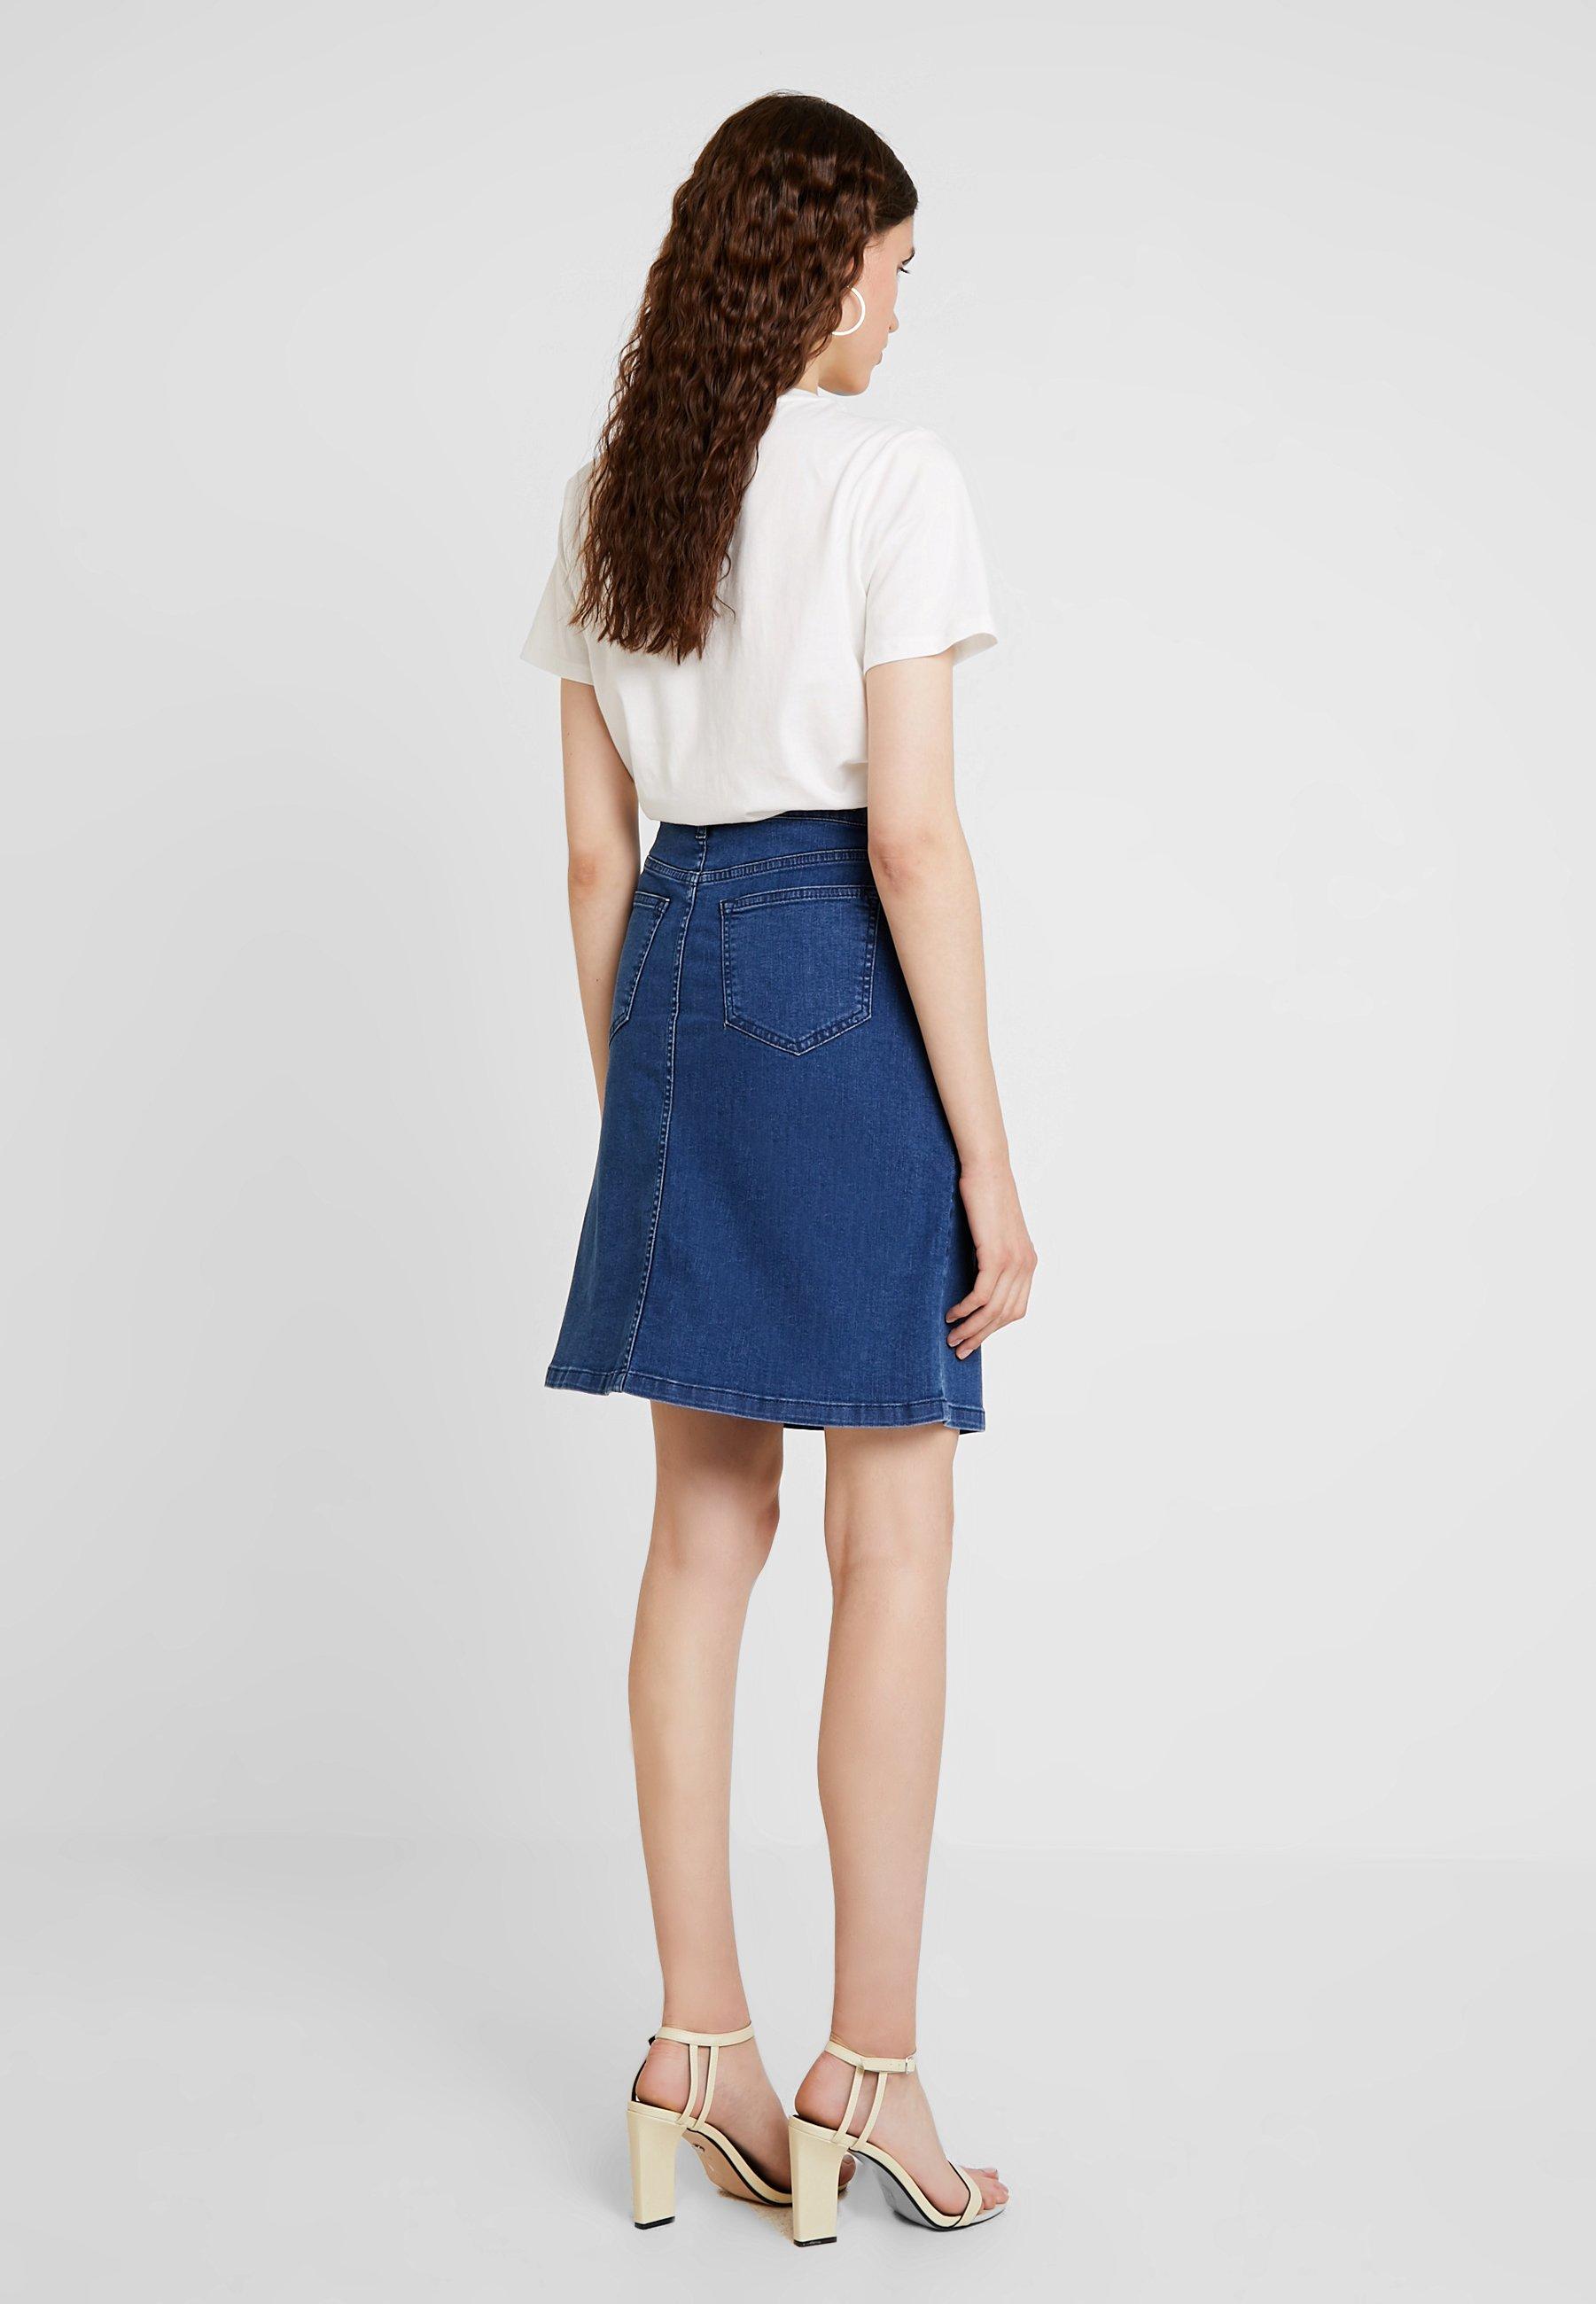 Campana Med Skirt Saint Blue A Above Tropez KneeGonna fmI7yYb6gv